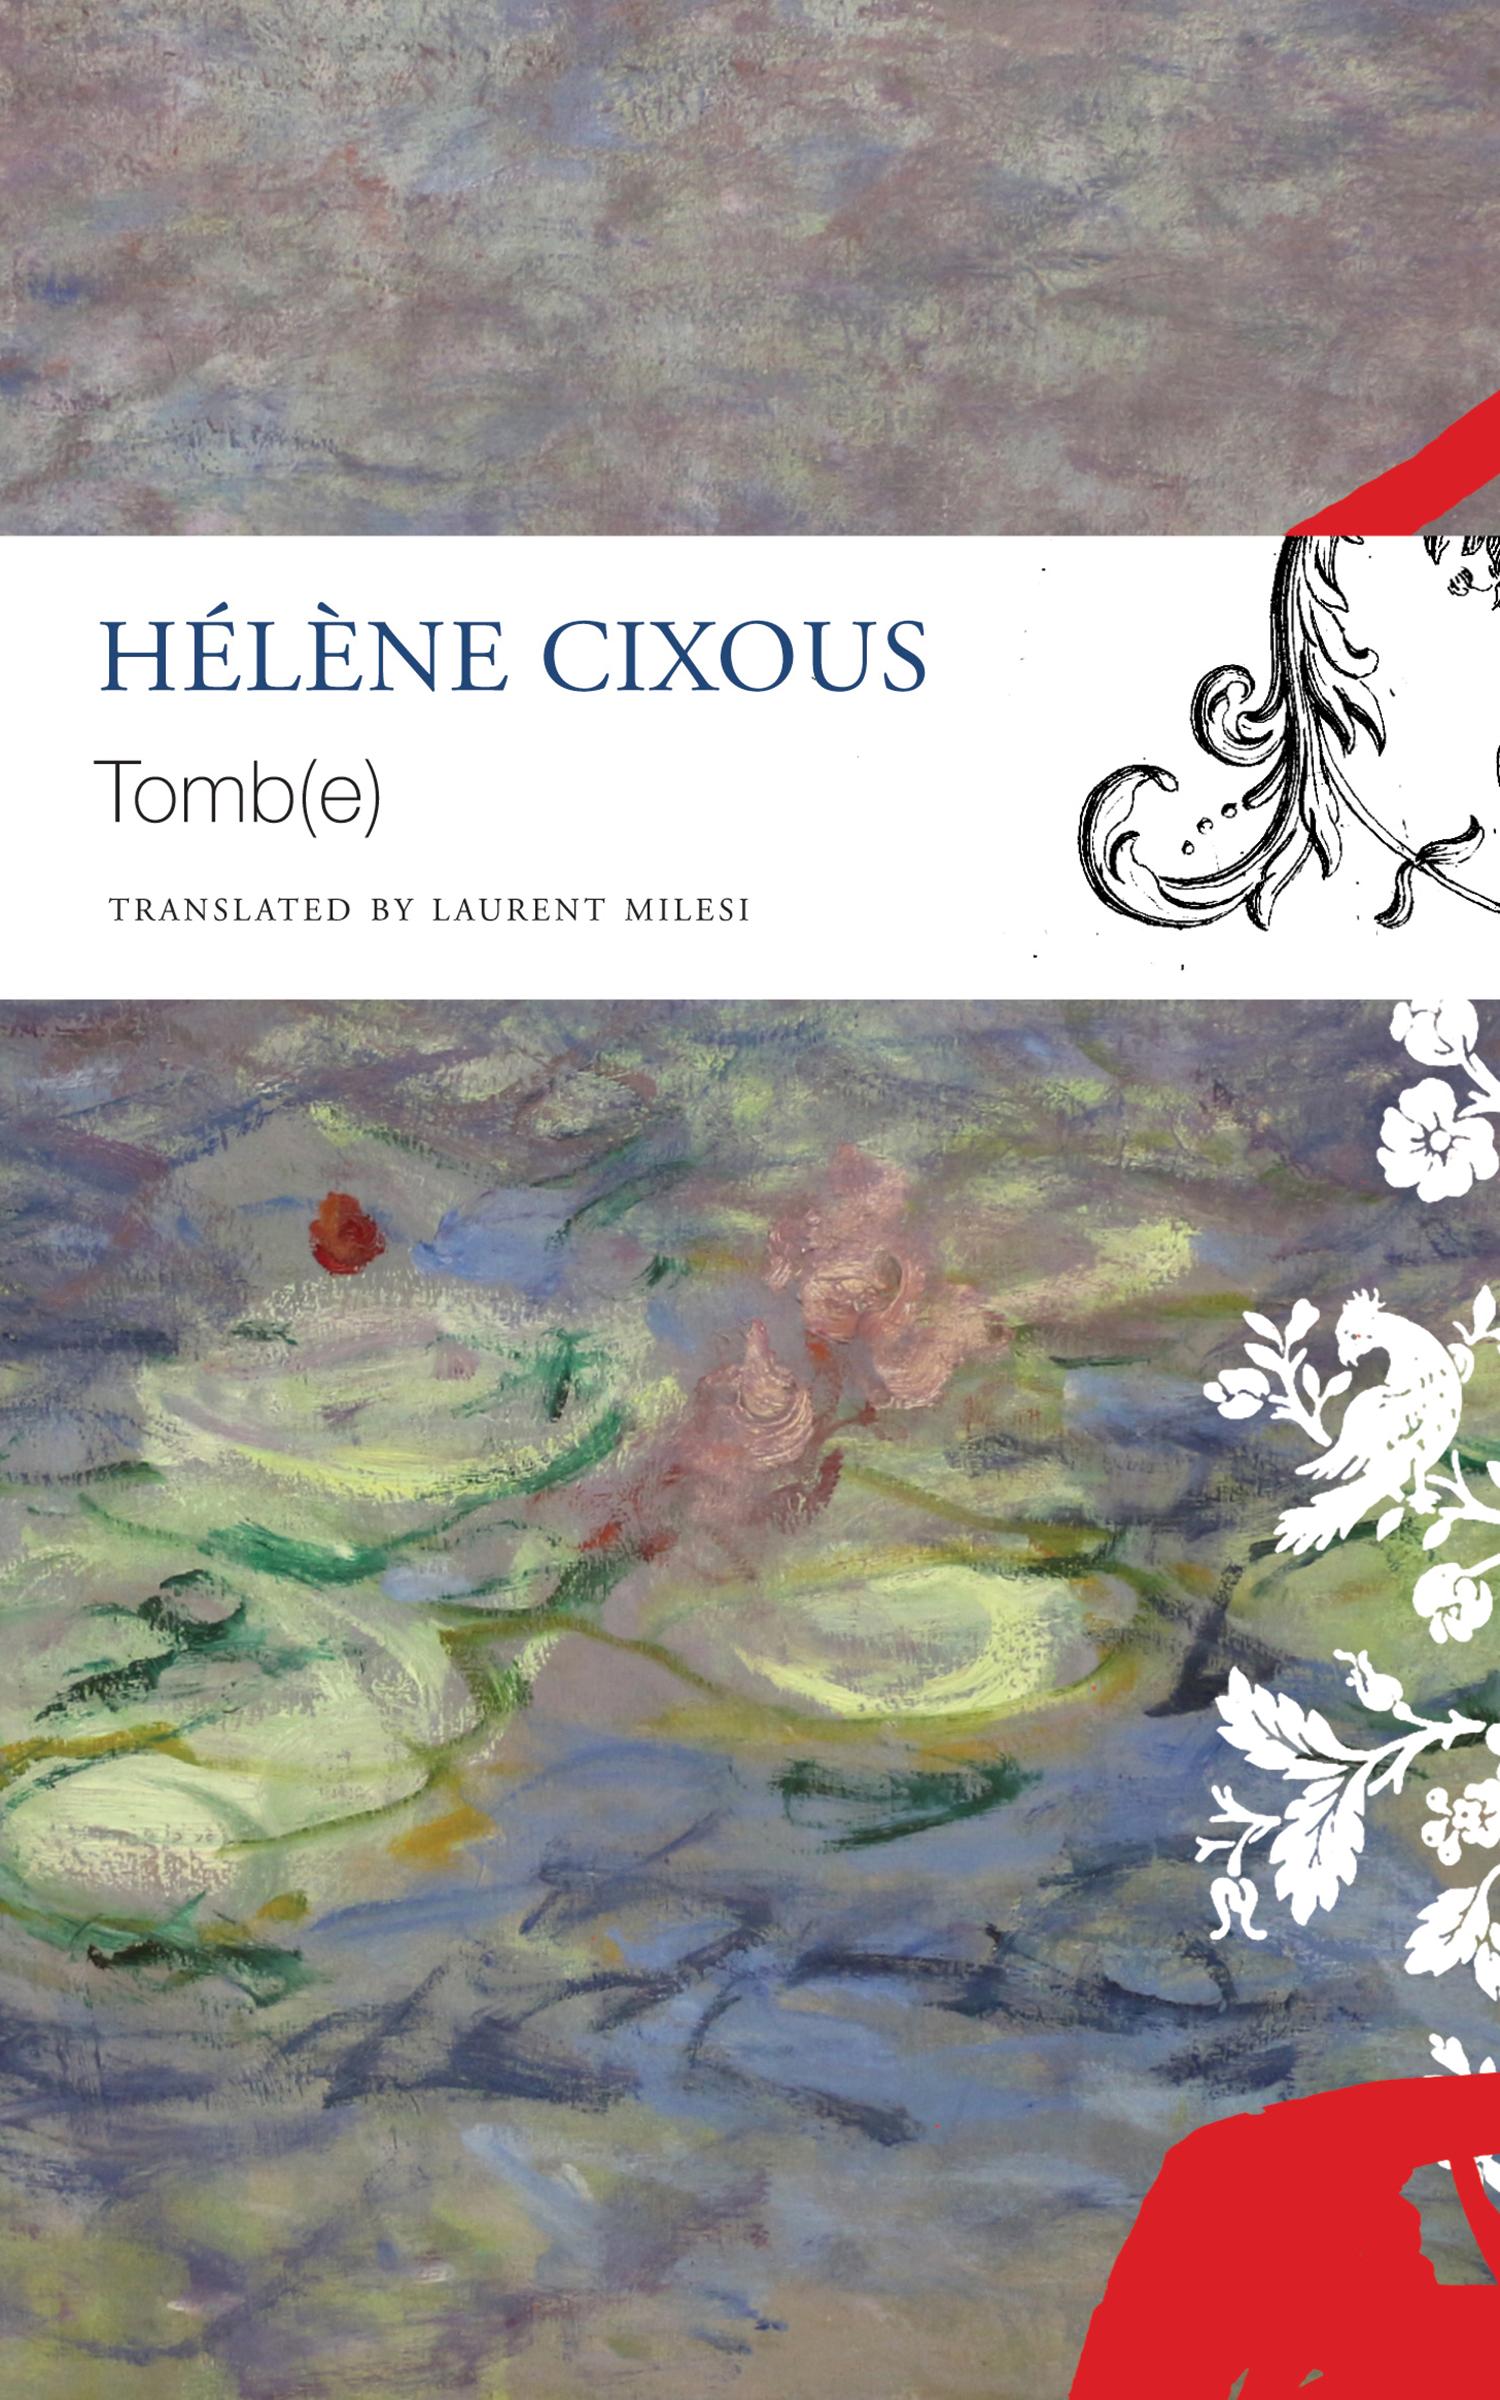 Tomb(e) by Hélène Cixous | Seagull Books